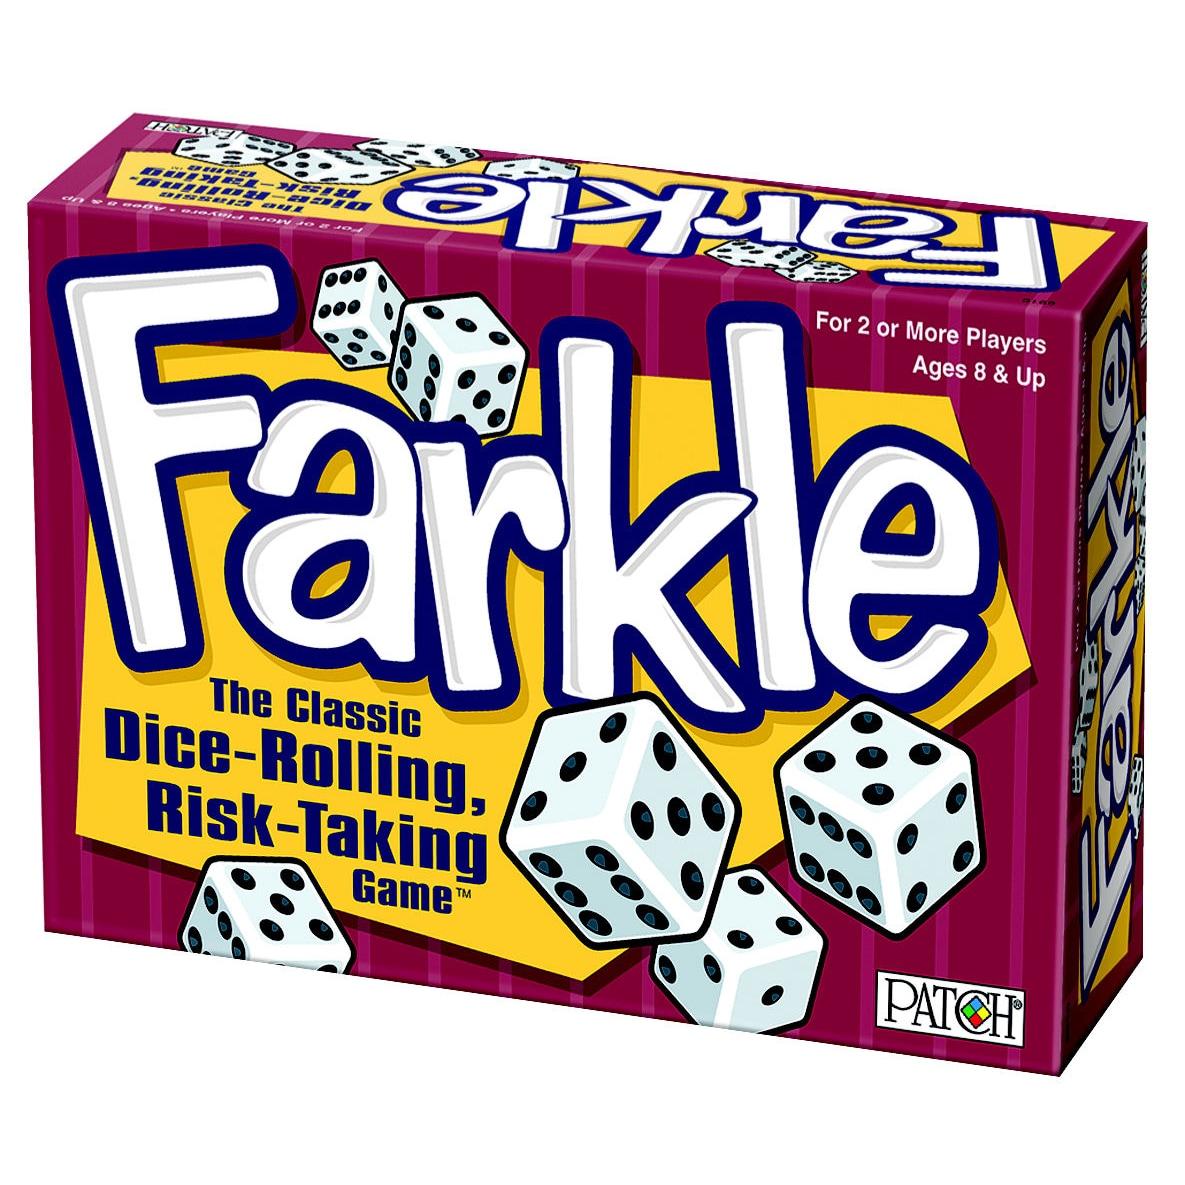 Patch Products Farkle Game Box-Farkle (Farkle), White